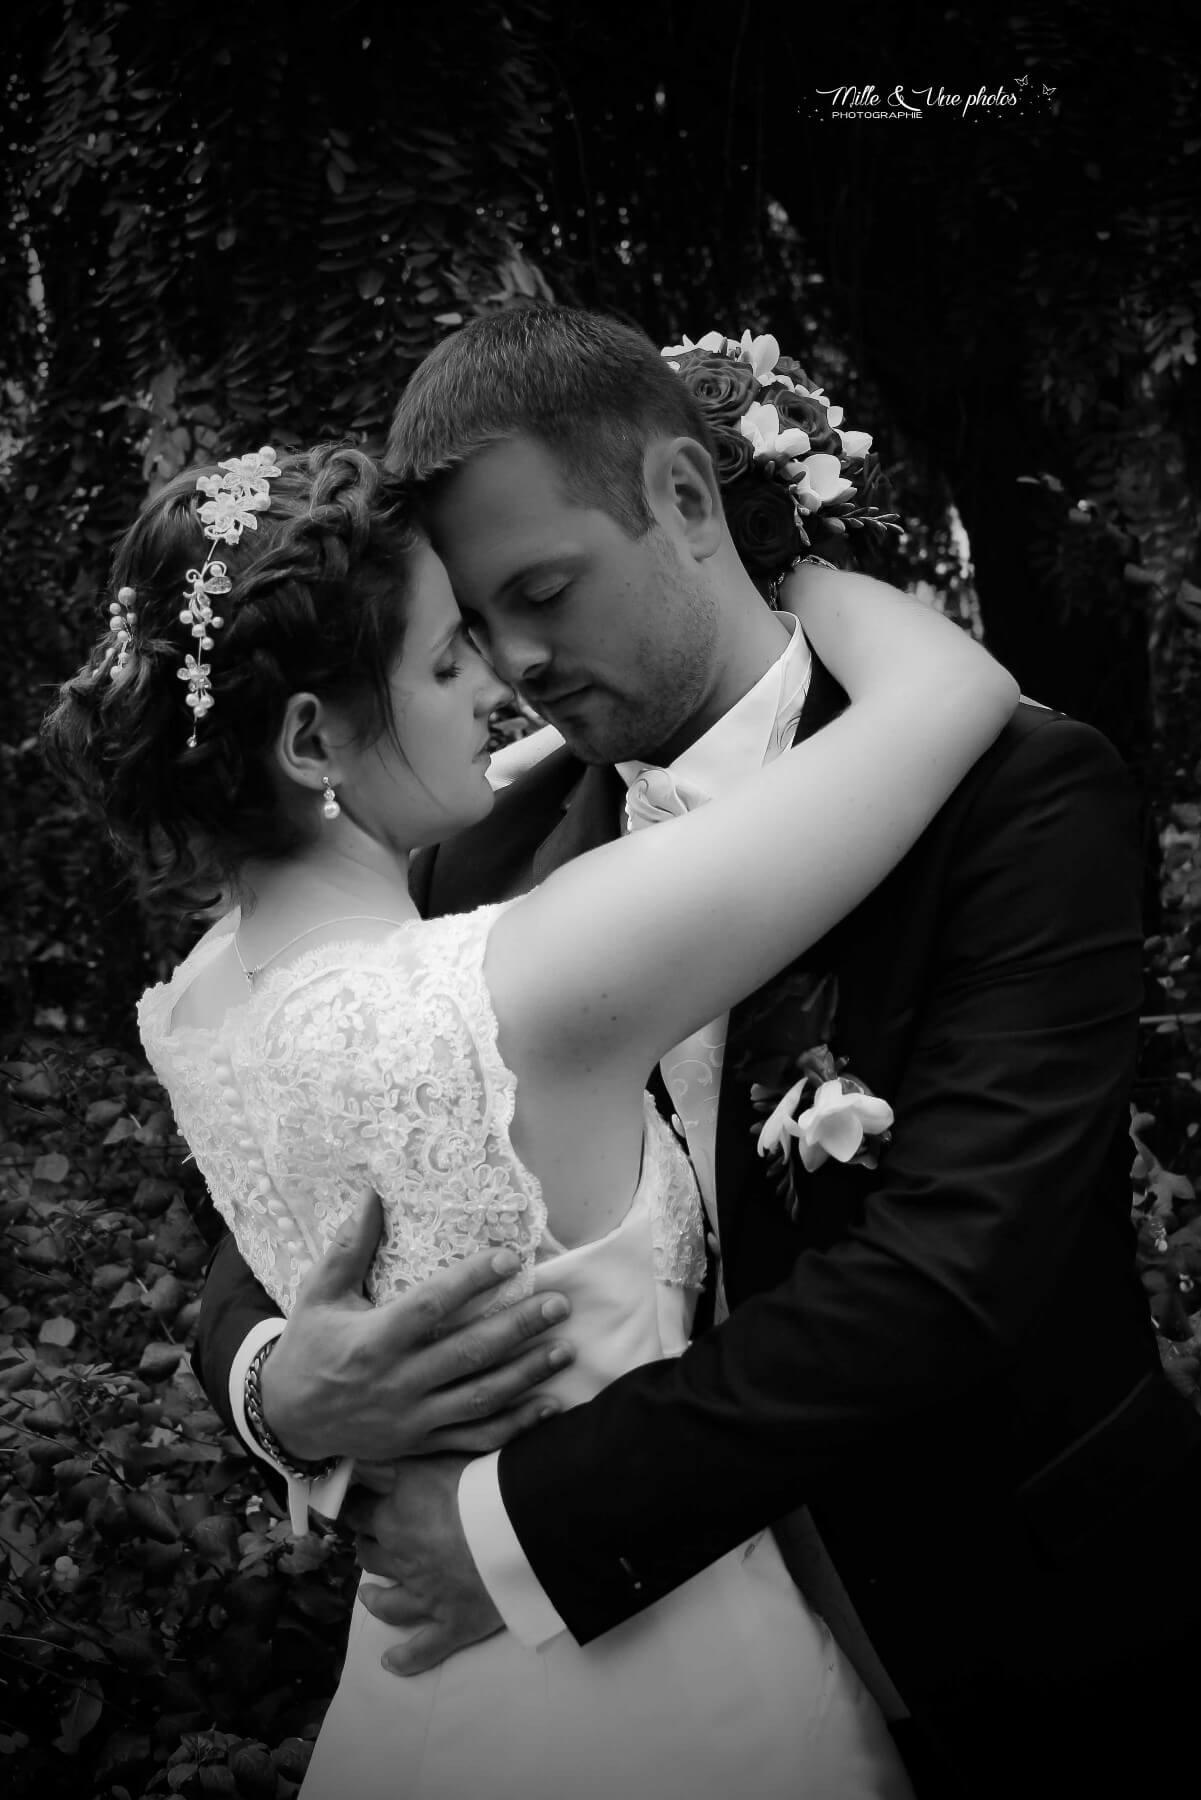 Mariage couple 1001photos moselle 2